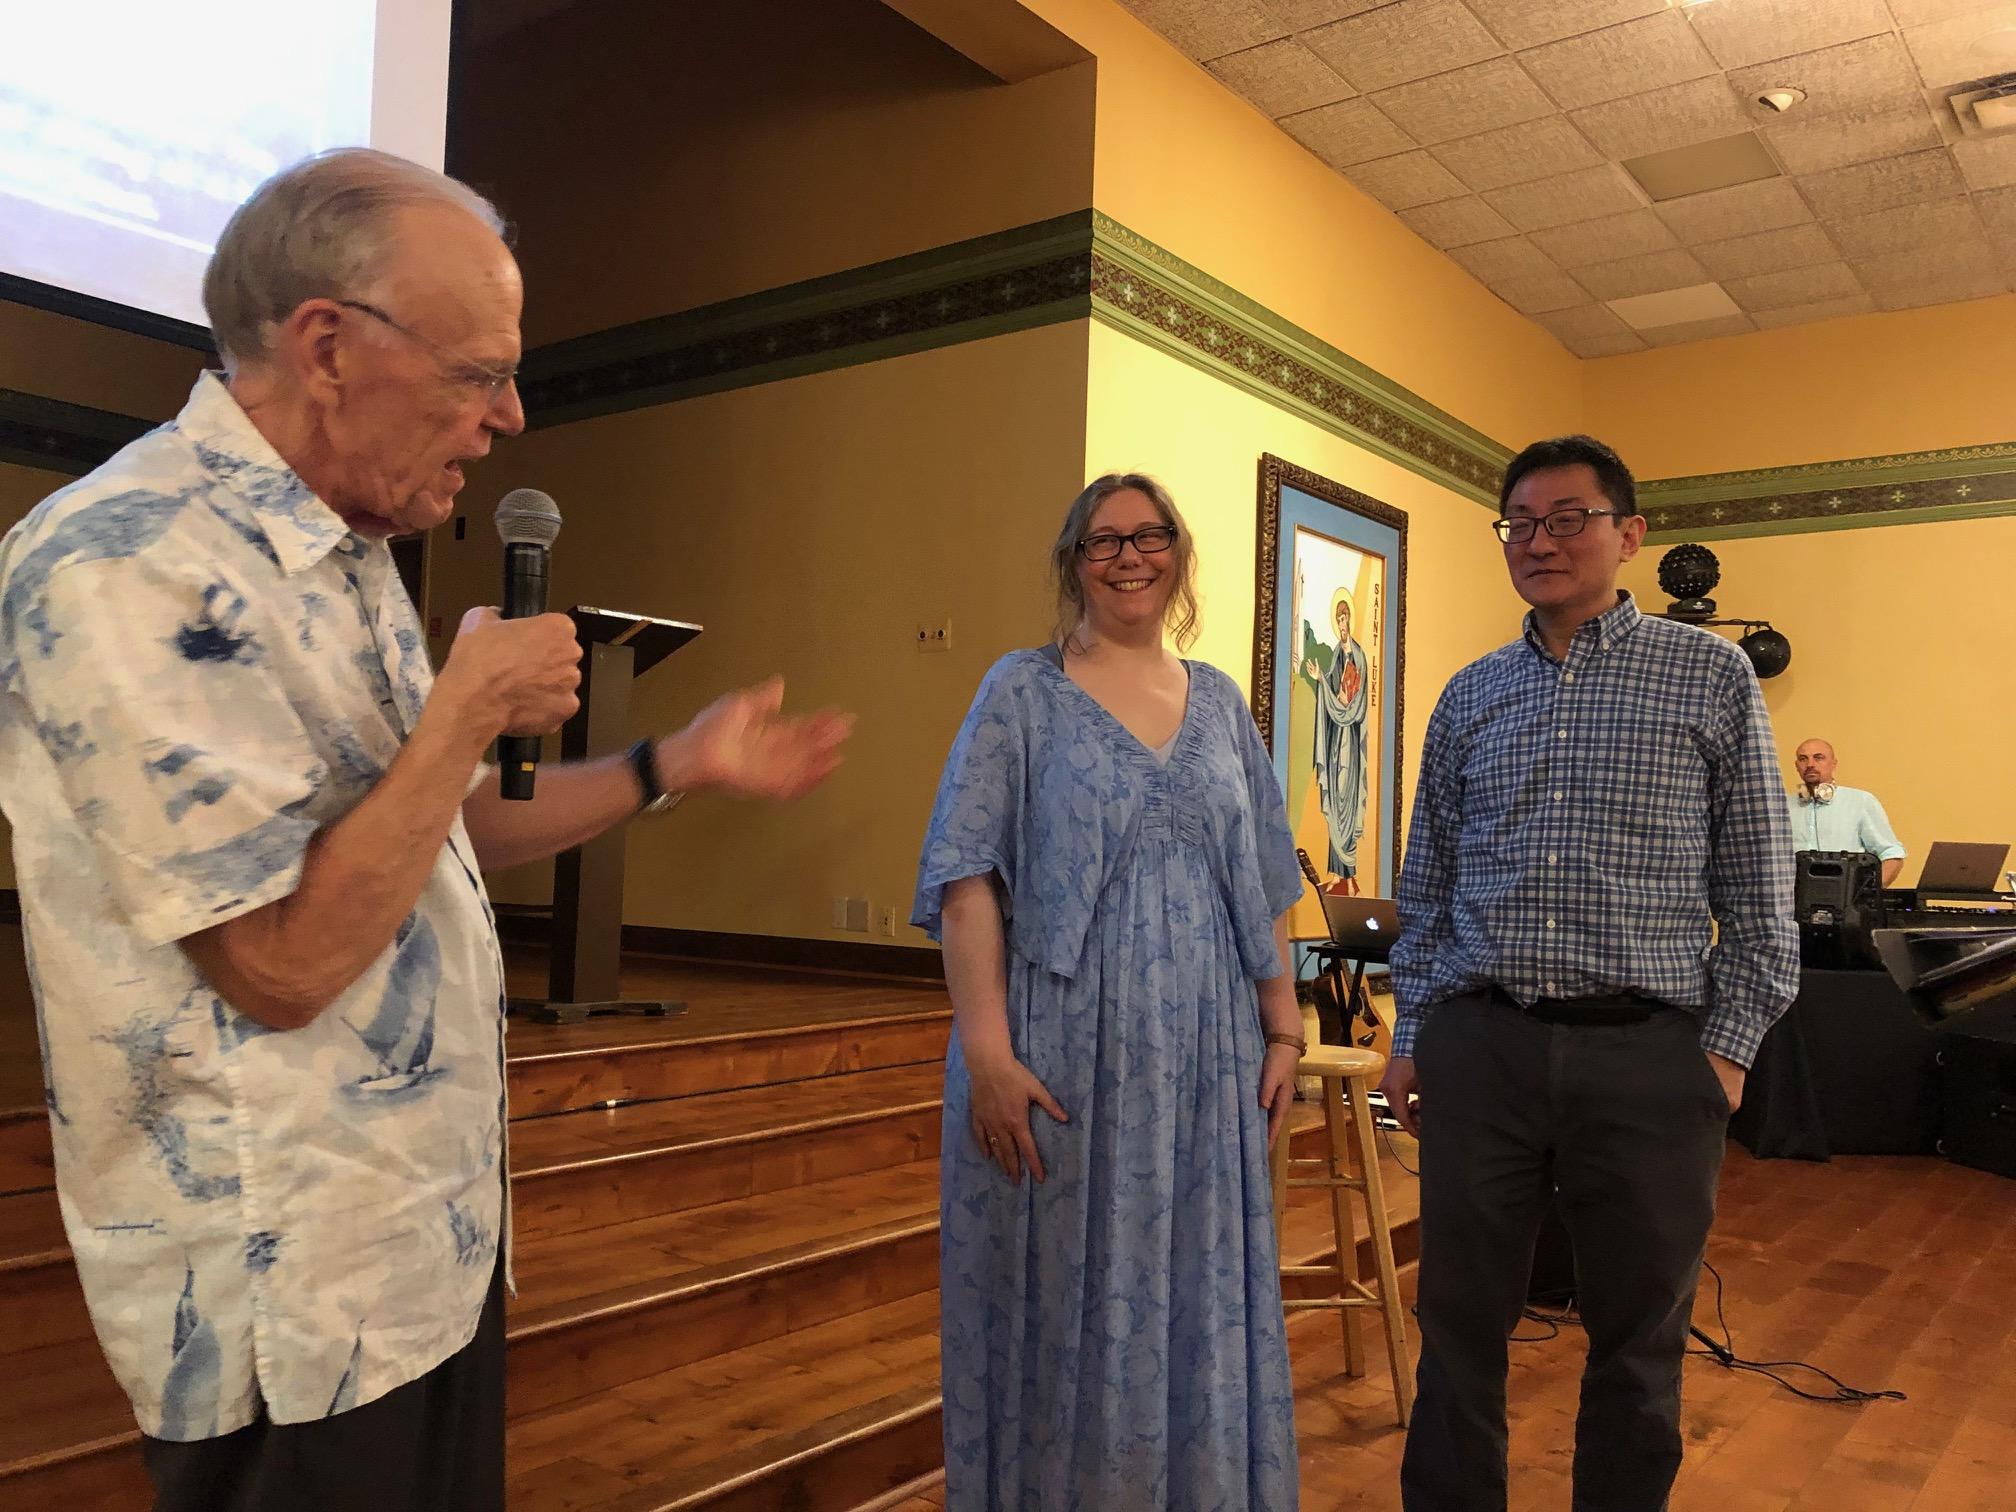 Maestro Shafer congratulates the highest ticket sellers. Not pictured: alto Maggie Sullivan